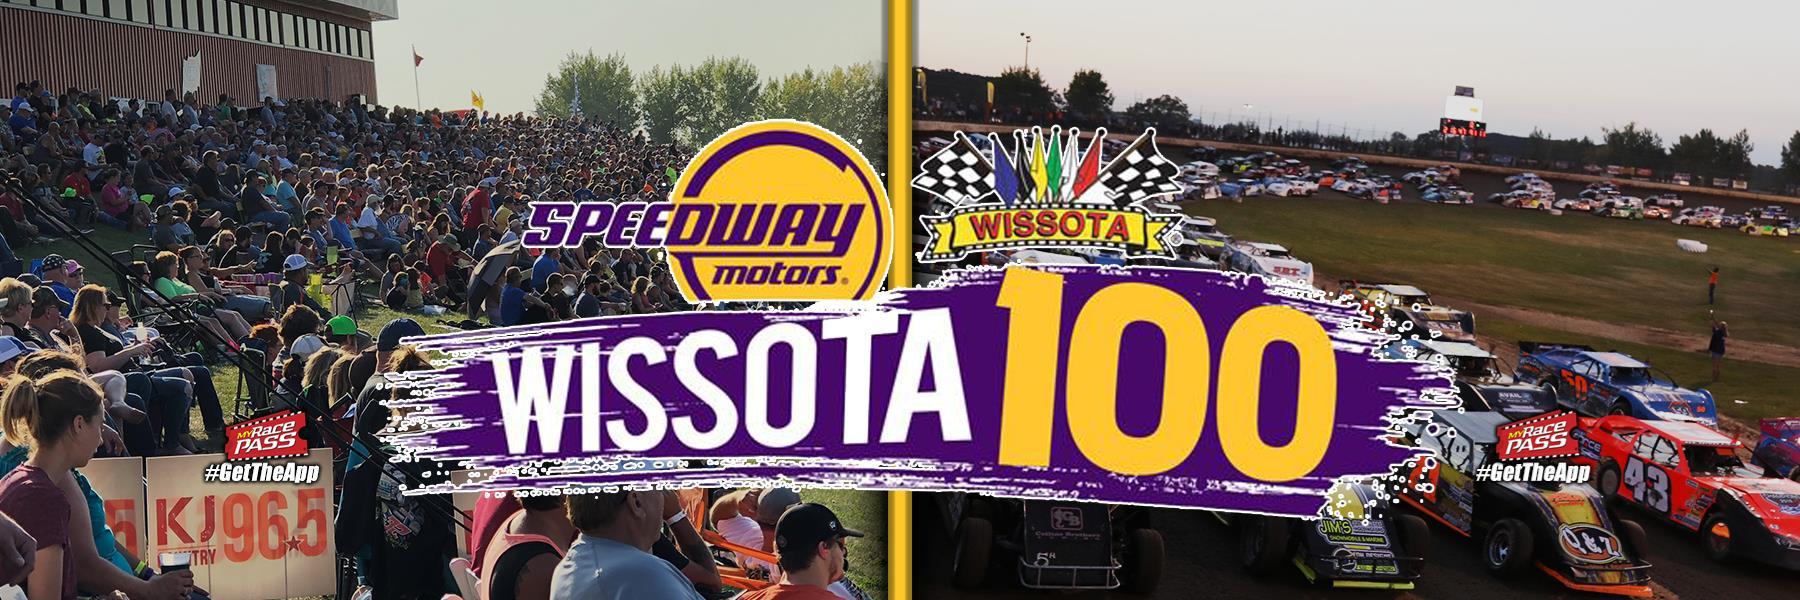 WISSOTA 100